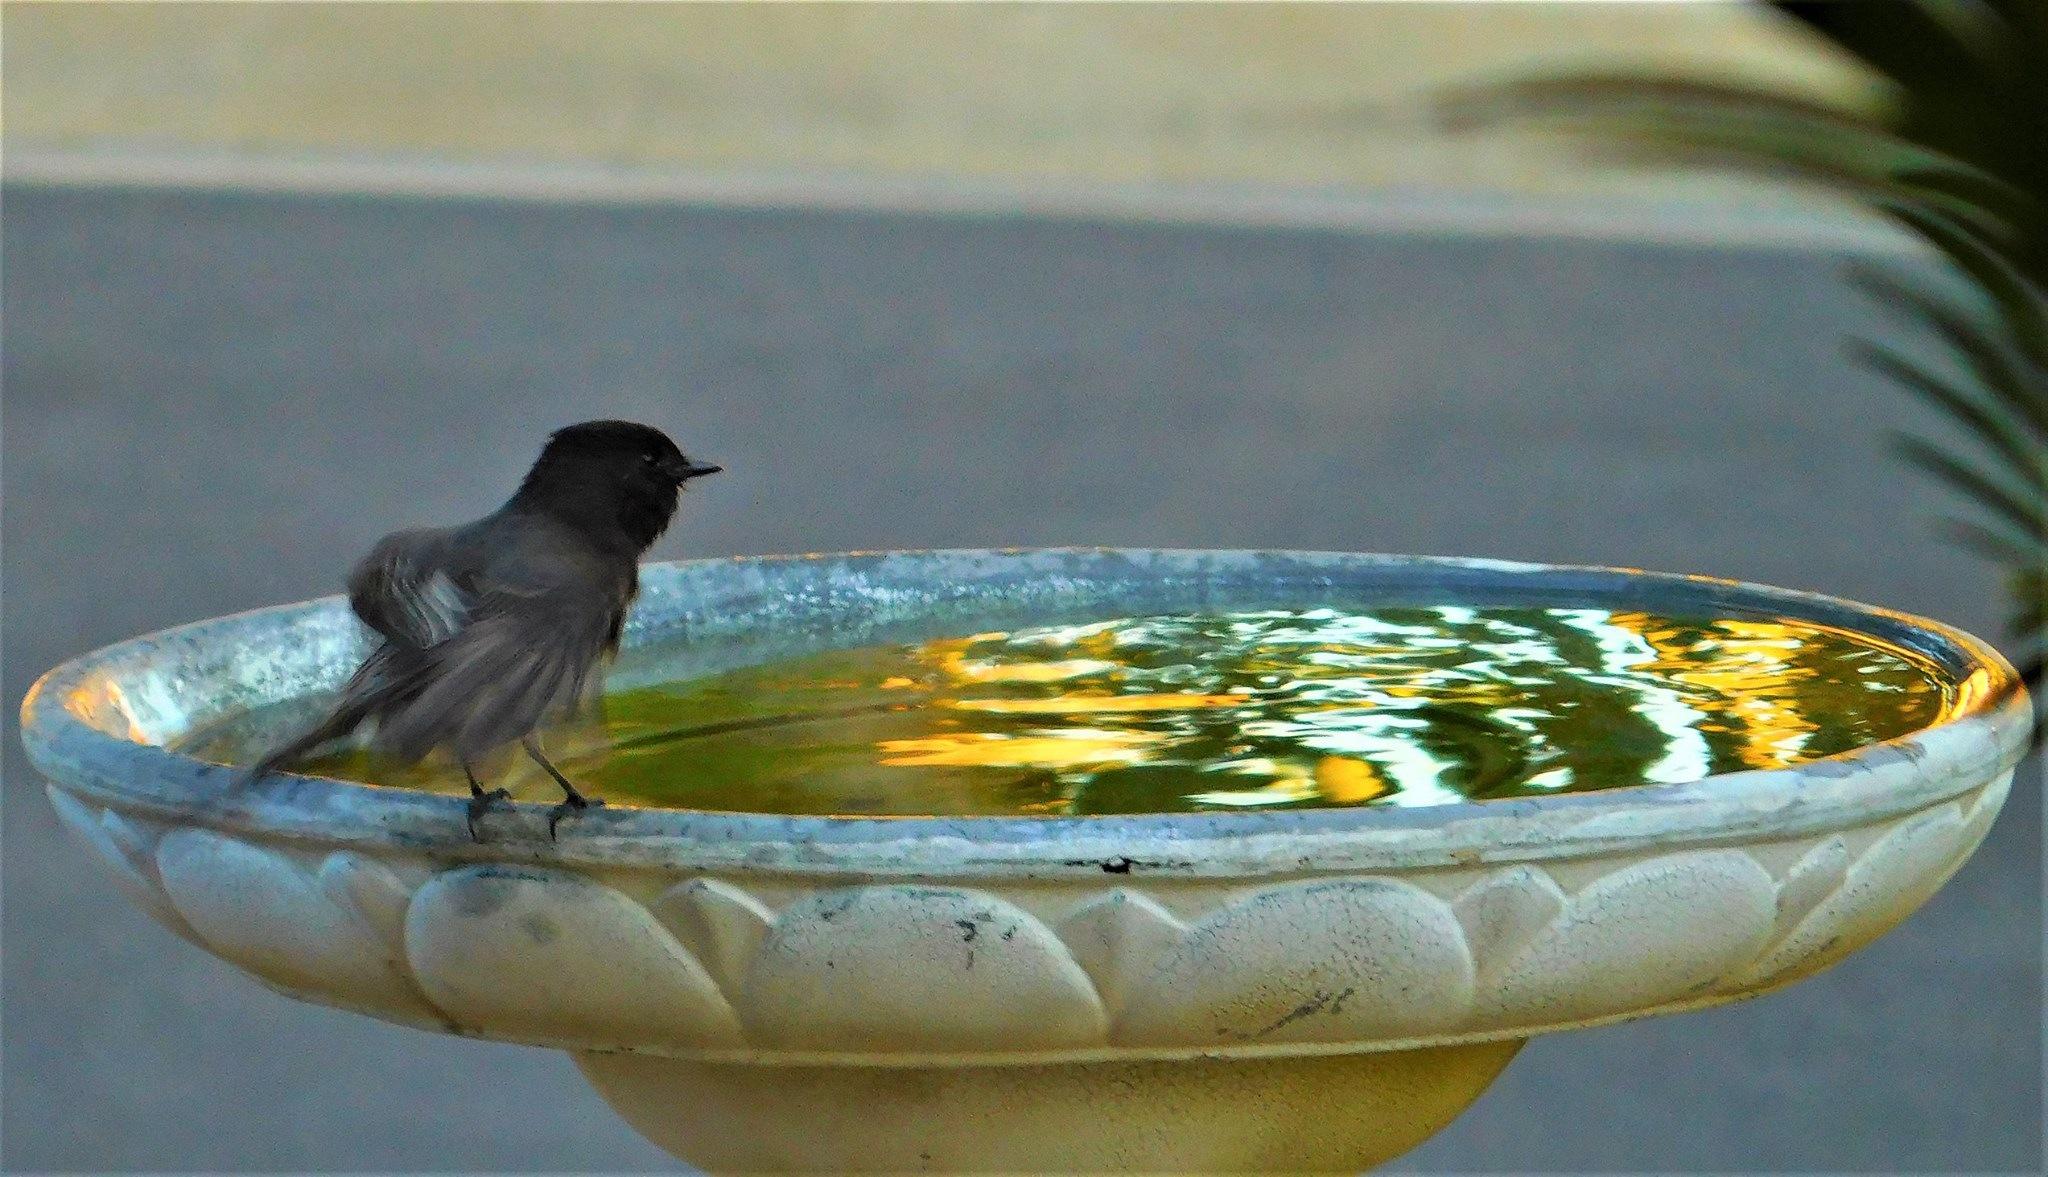 fastidious little bird by MarthaHerman